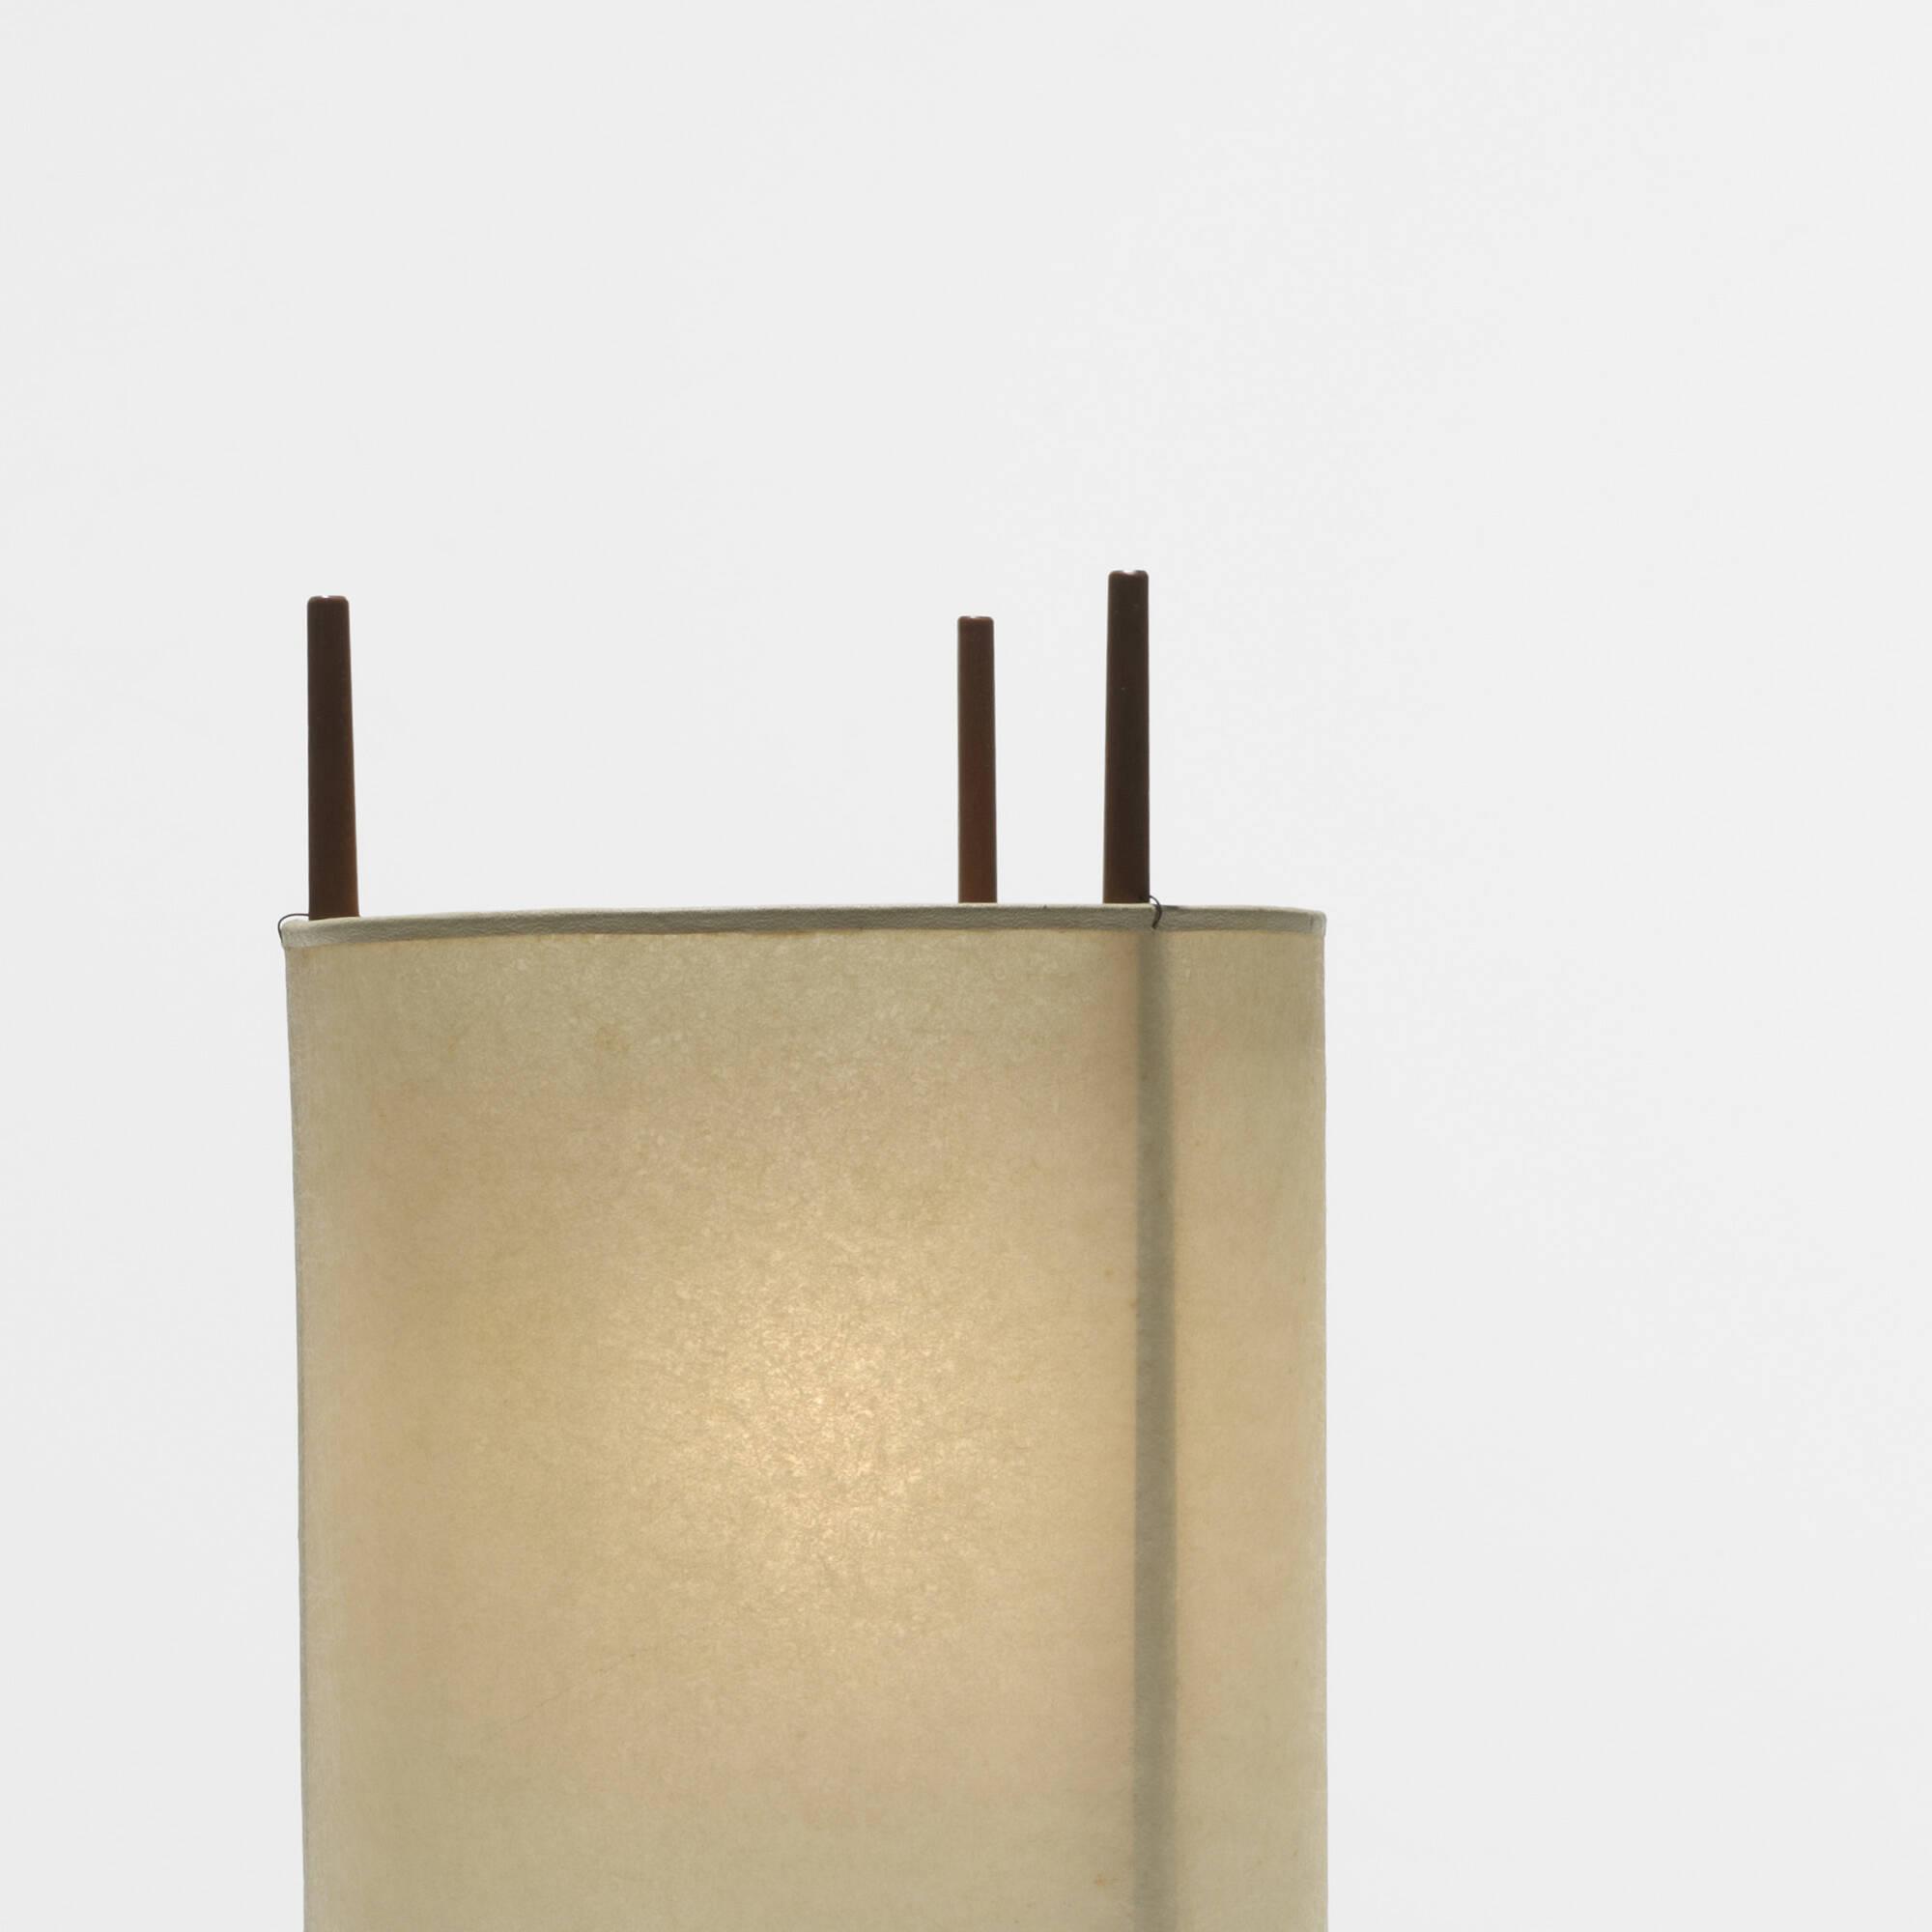 147: ISAMU NOGUCHI, table lamp